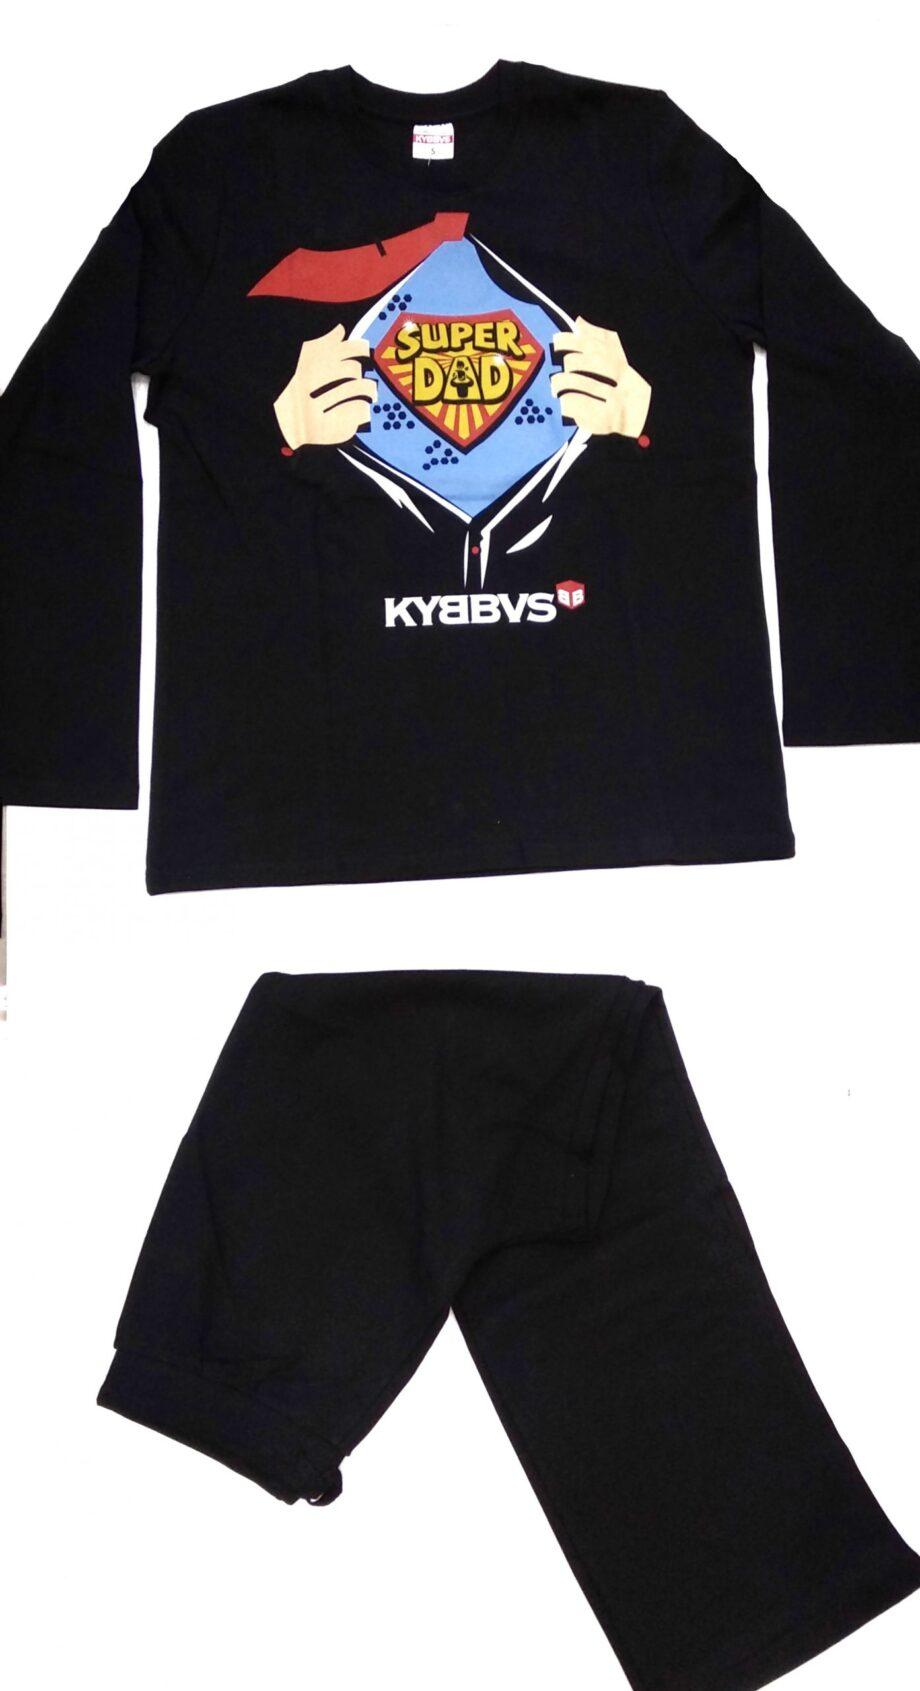 pijama-kybbus-super-dad-black-man-scaled-1.jpeg